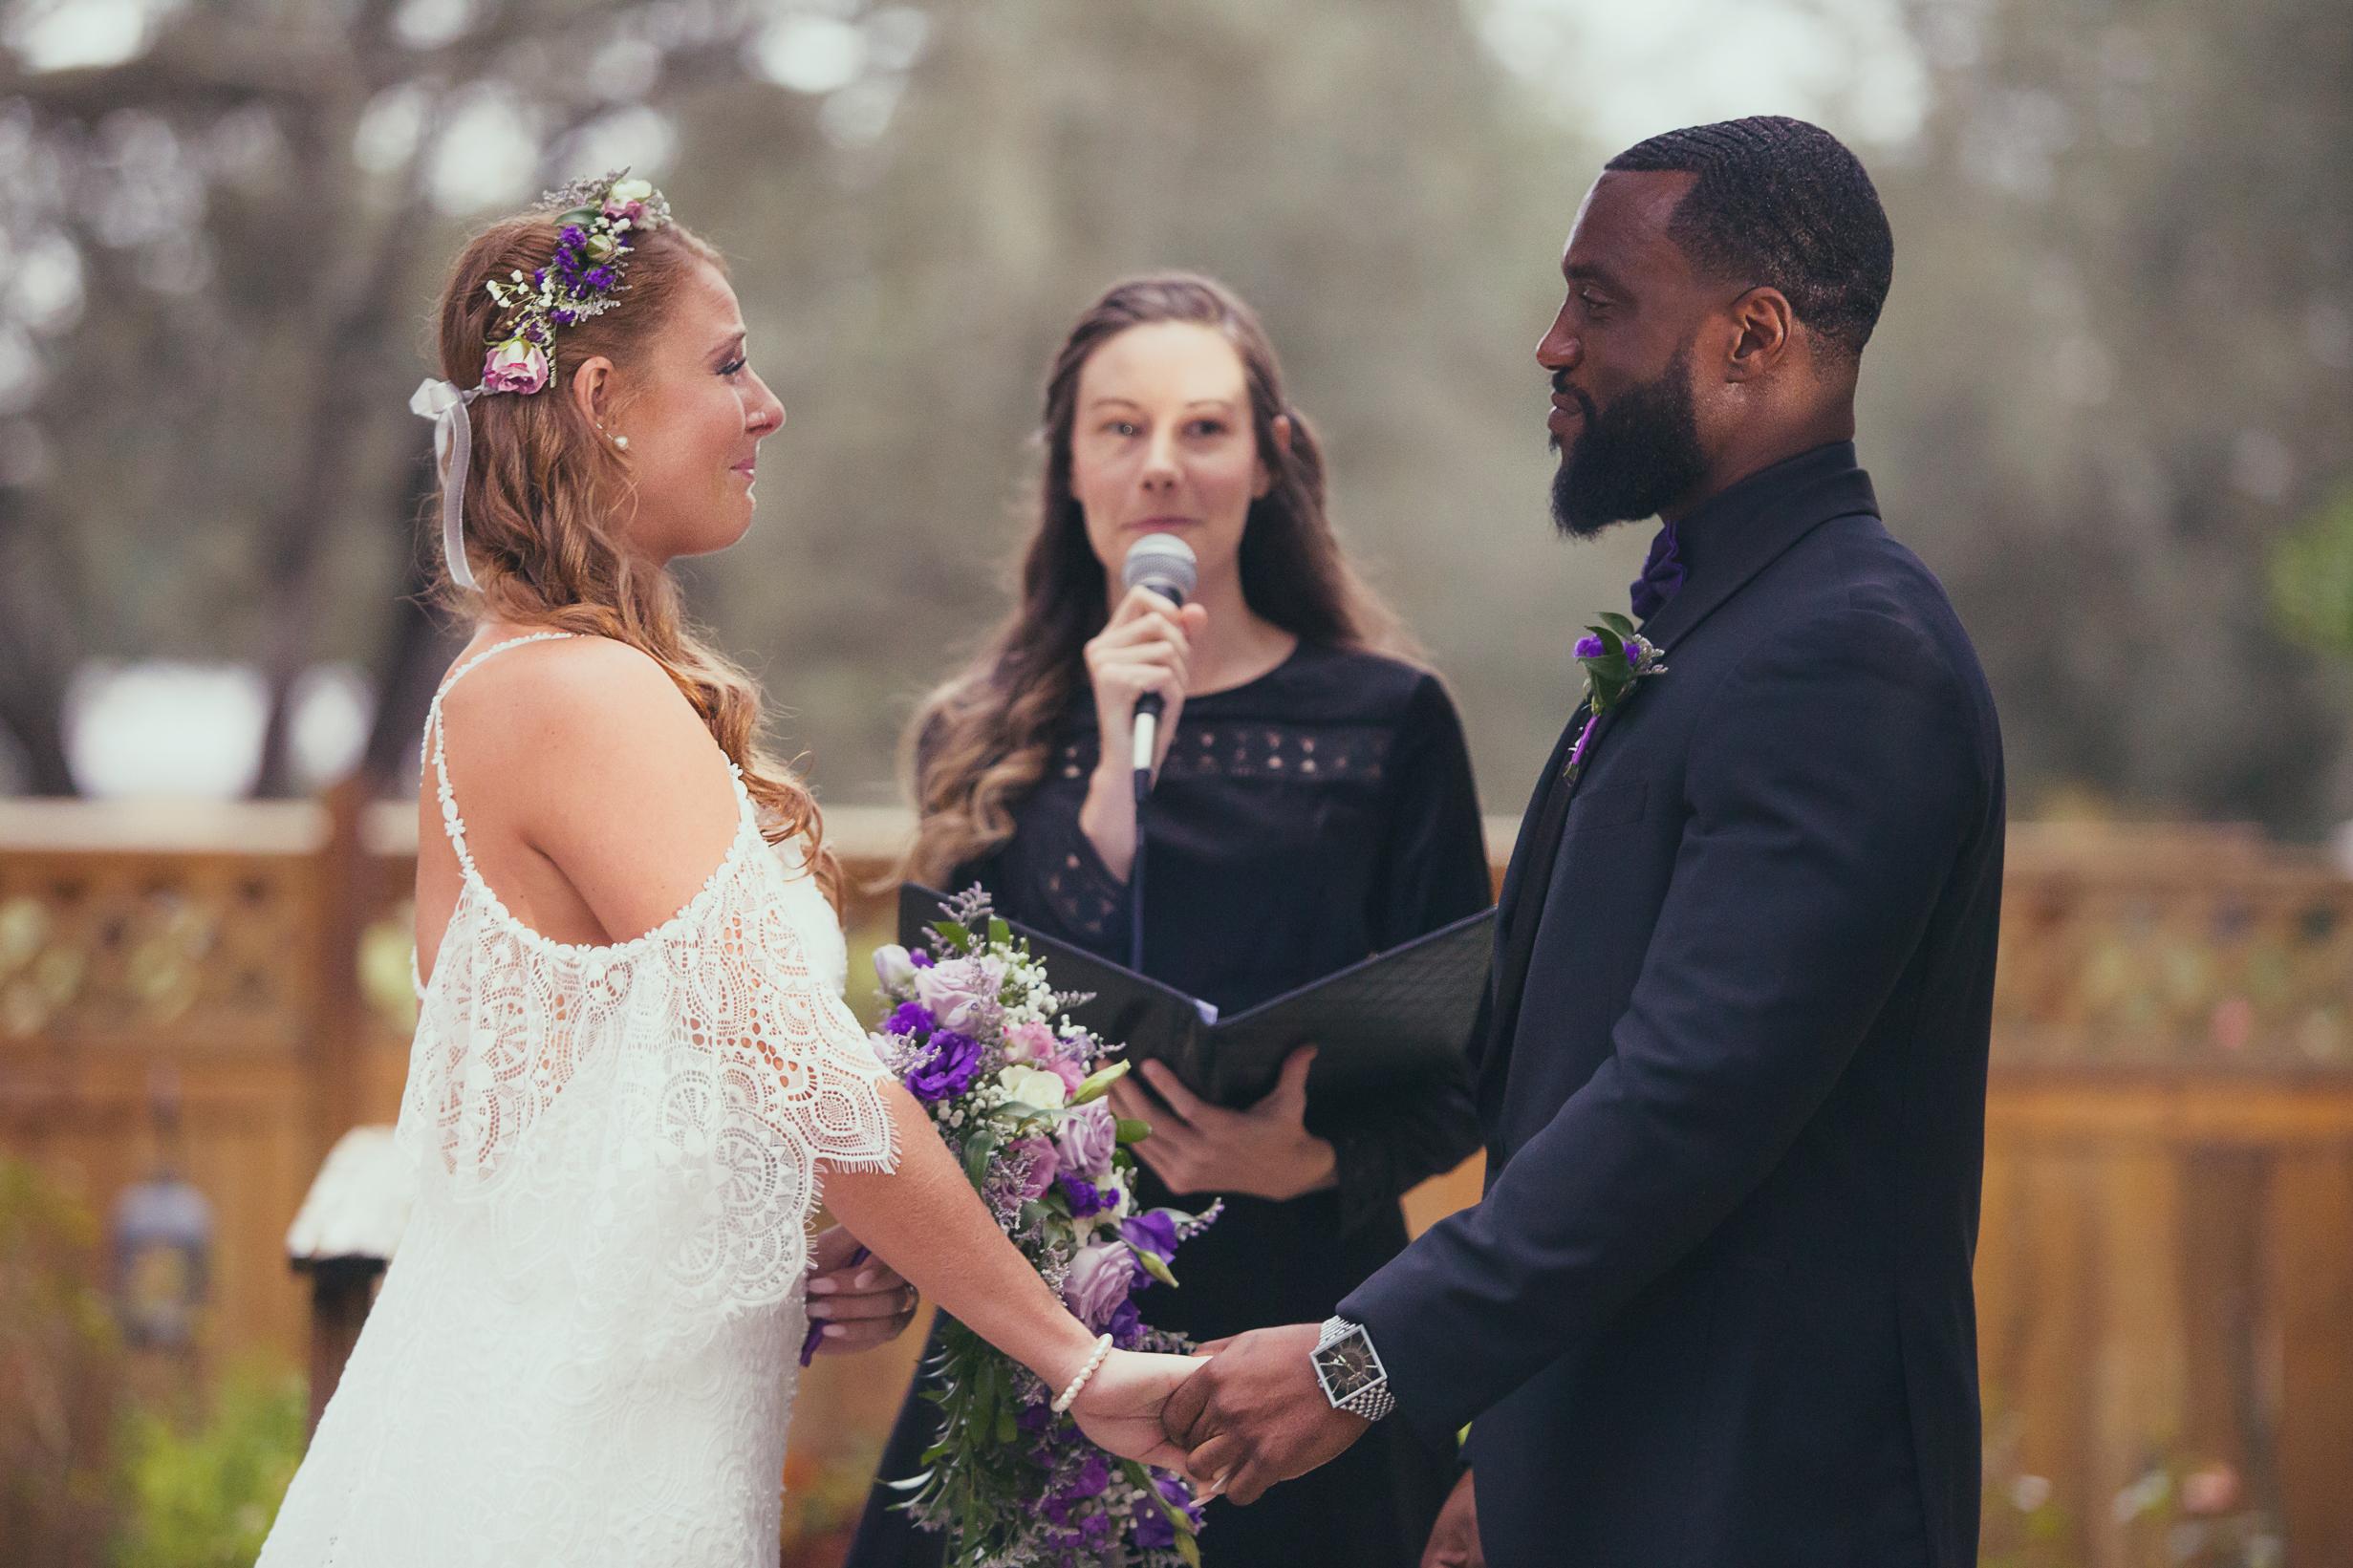 harmony-gardens-wedding-chamber-photography-moments-antoine-hart-8.jpg